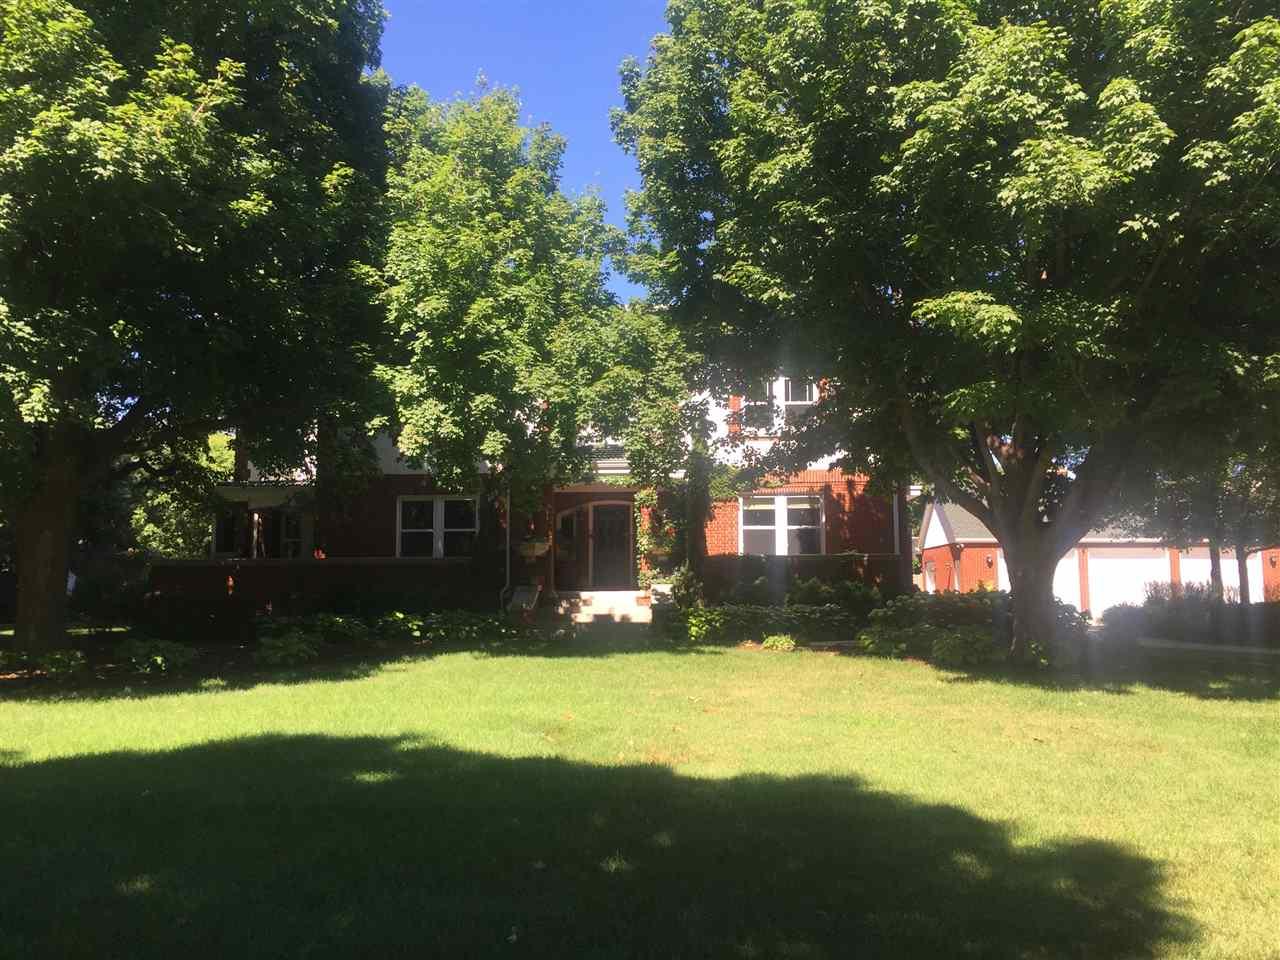 1125 Lincoln, Hastings, Nebraska 3 Bedroom as one of Homes & Land Real Estate